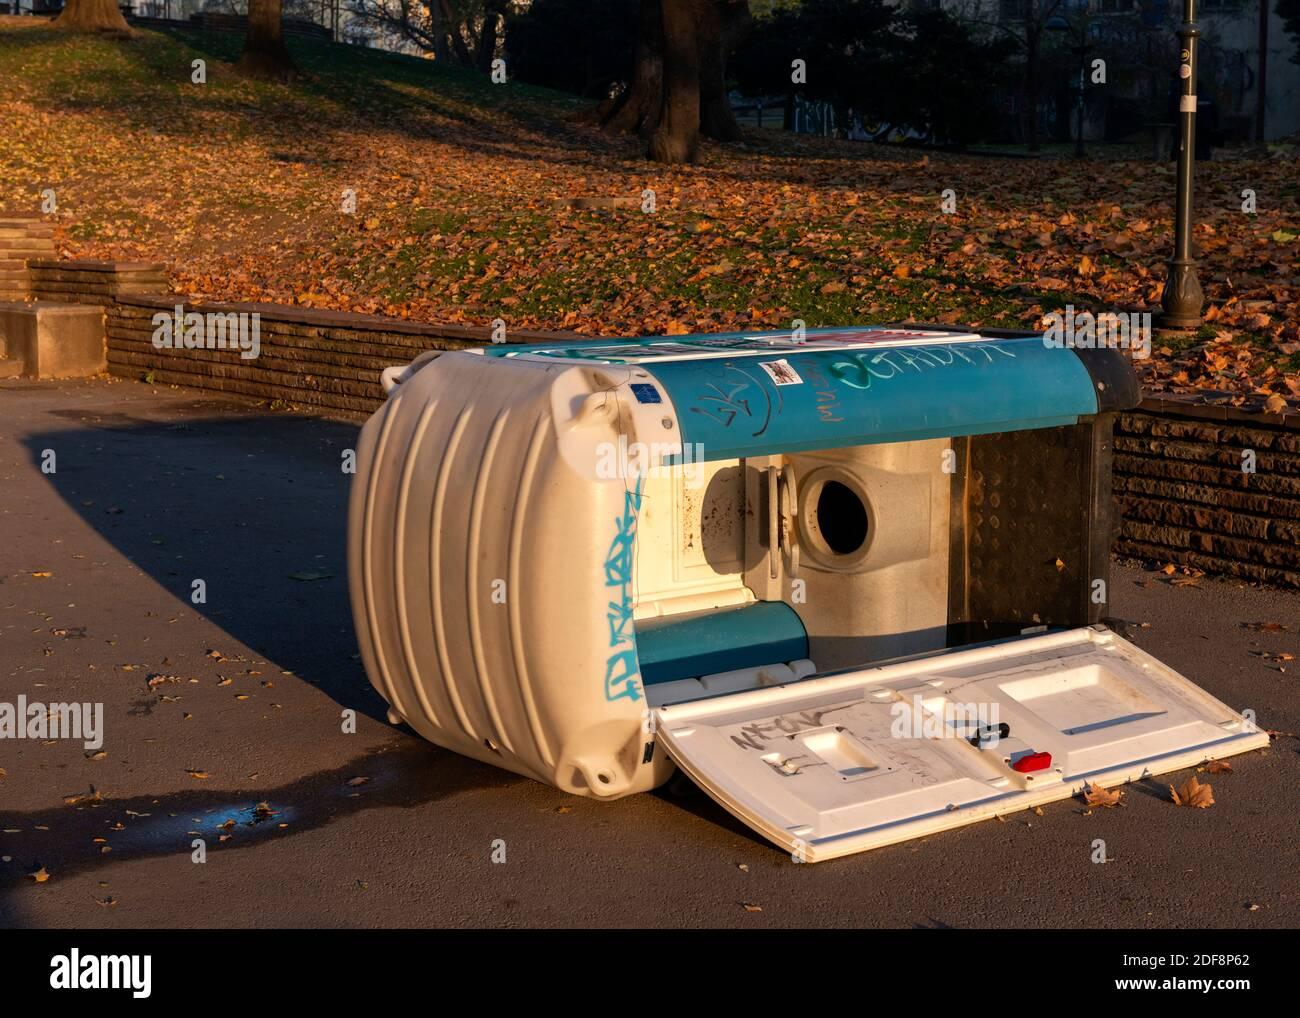 vandalised-public-portable-chemical-toilet-lavatory-2DF8P62.jpg